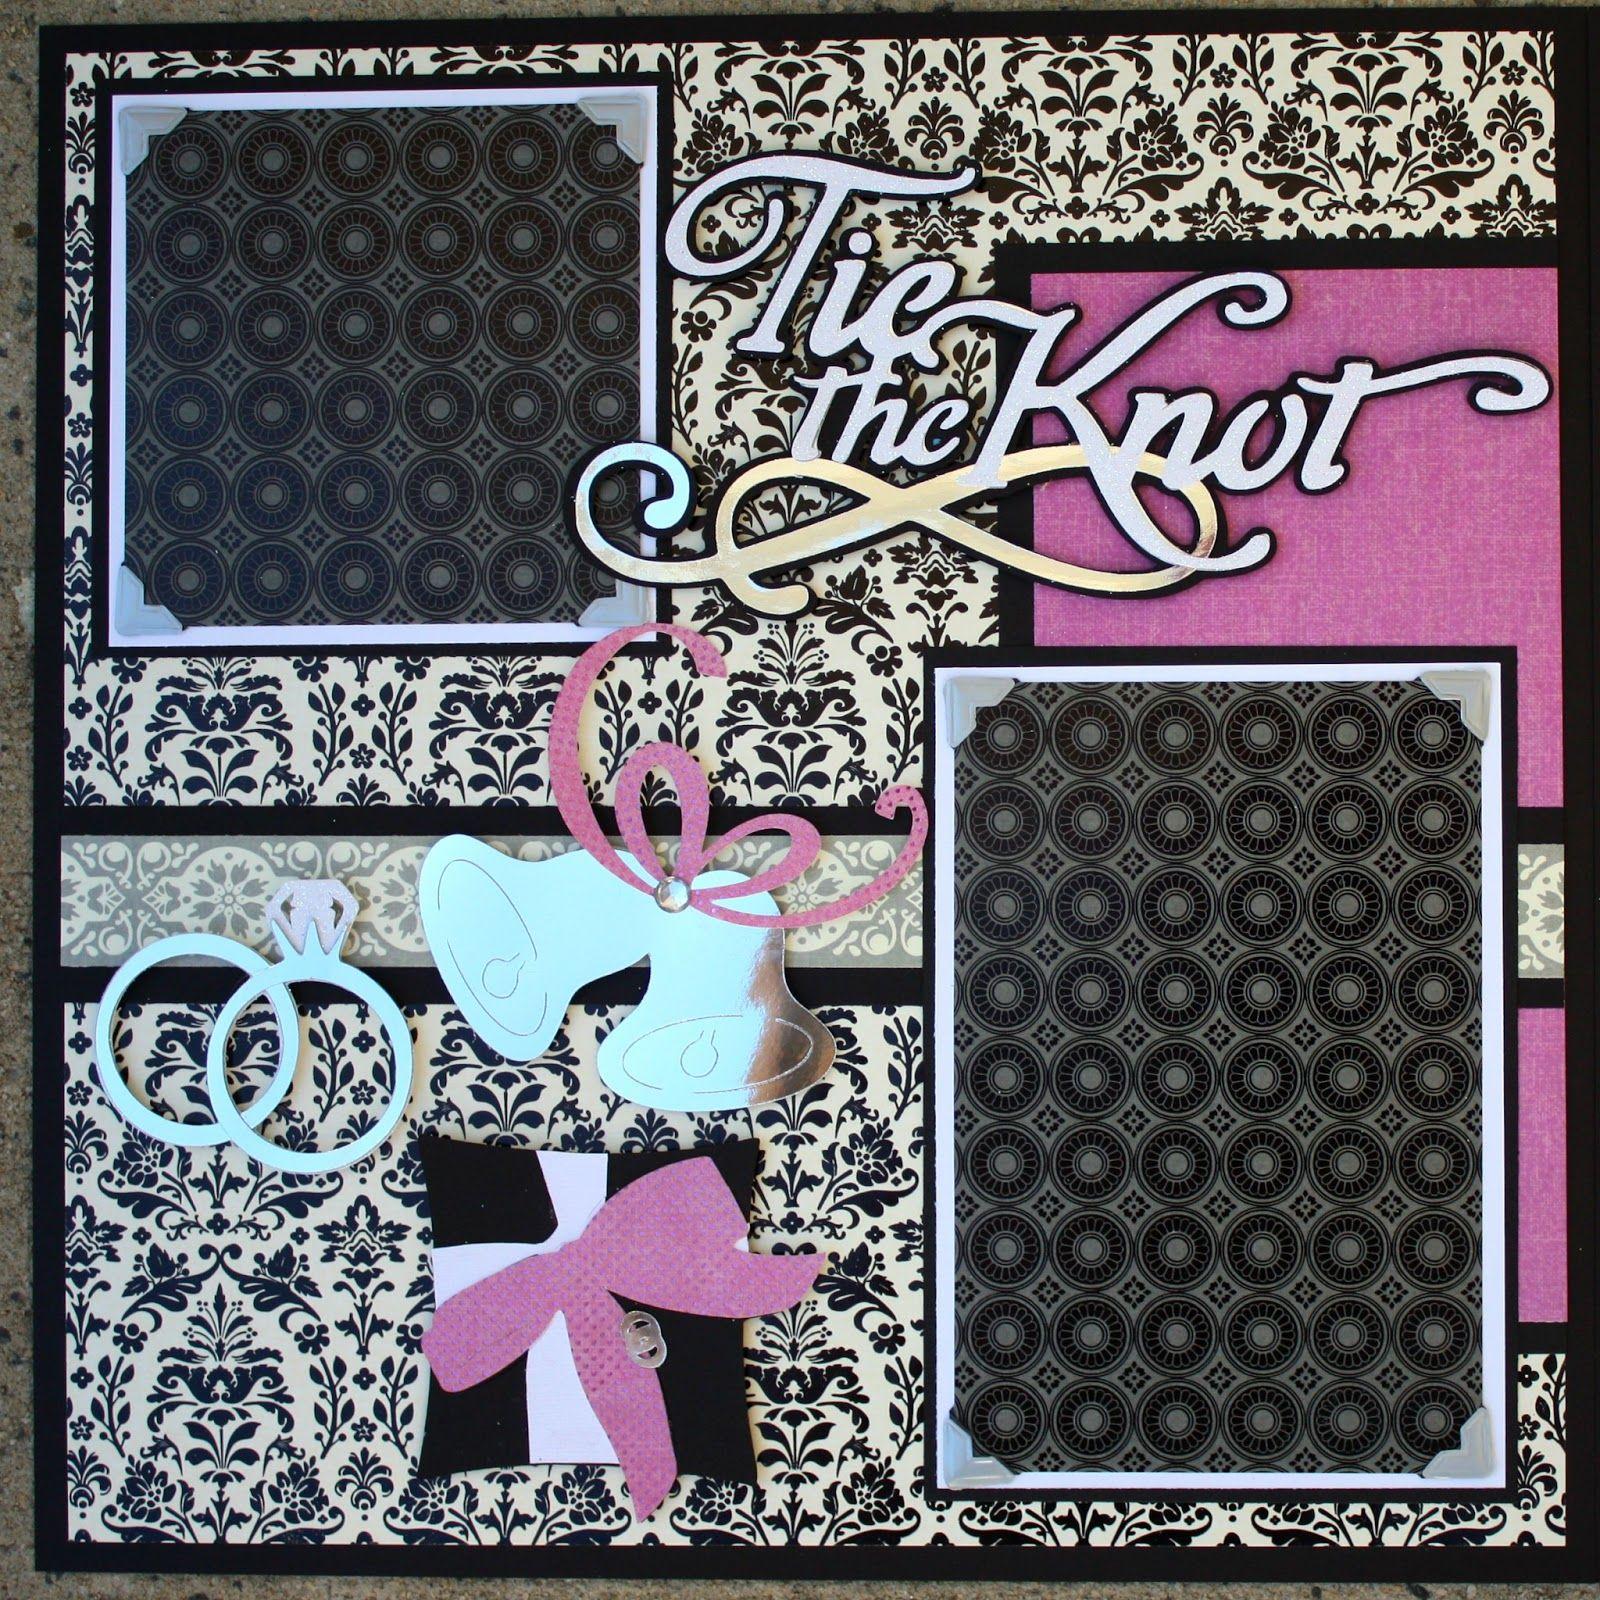 Wedding scrapbook ideas using cricut - Cricut Wedding Scrapbook Layouts Wedding Album Series Tie The Knot 12x12 Double Scrapbook Layout